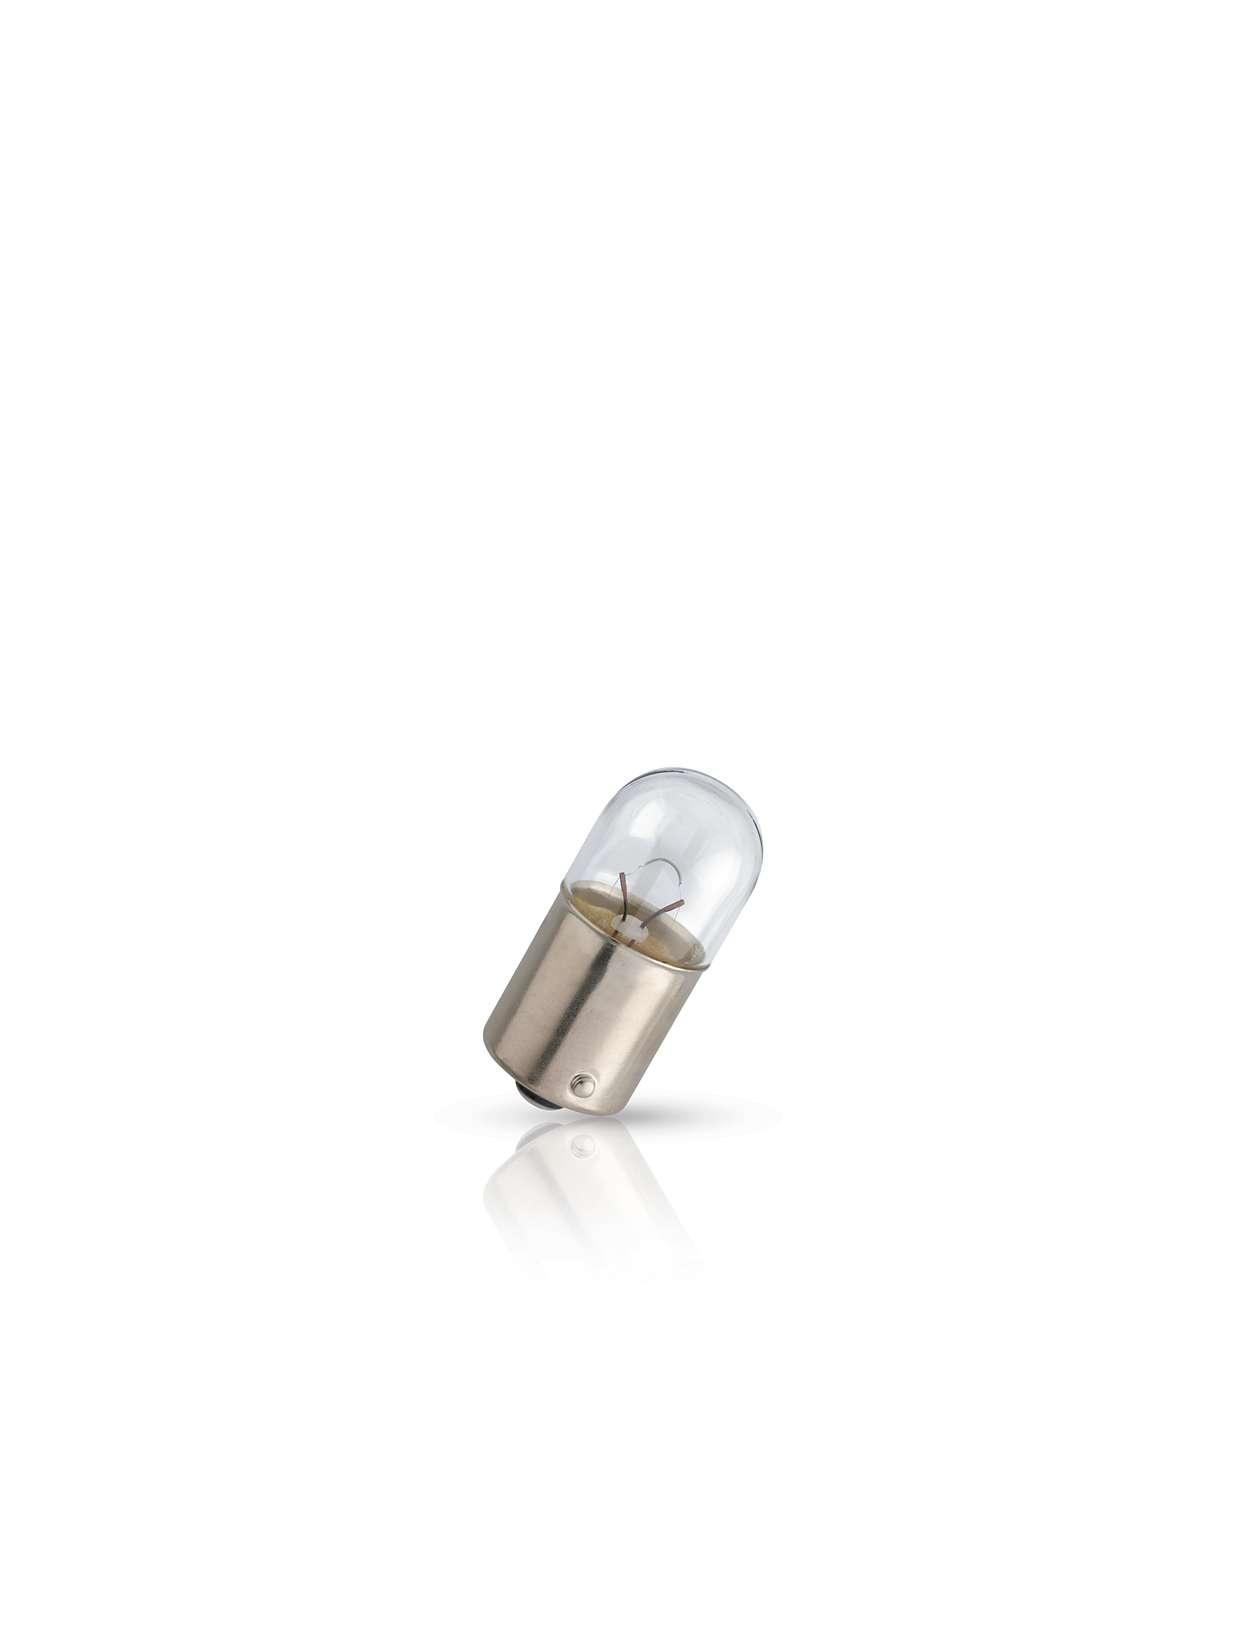 Лампа автомобильная Philips 12821llecob2 (бл.) автомобильная лампа r5w 5w 2 шт philips